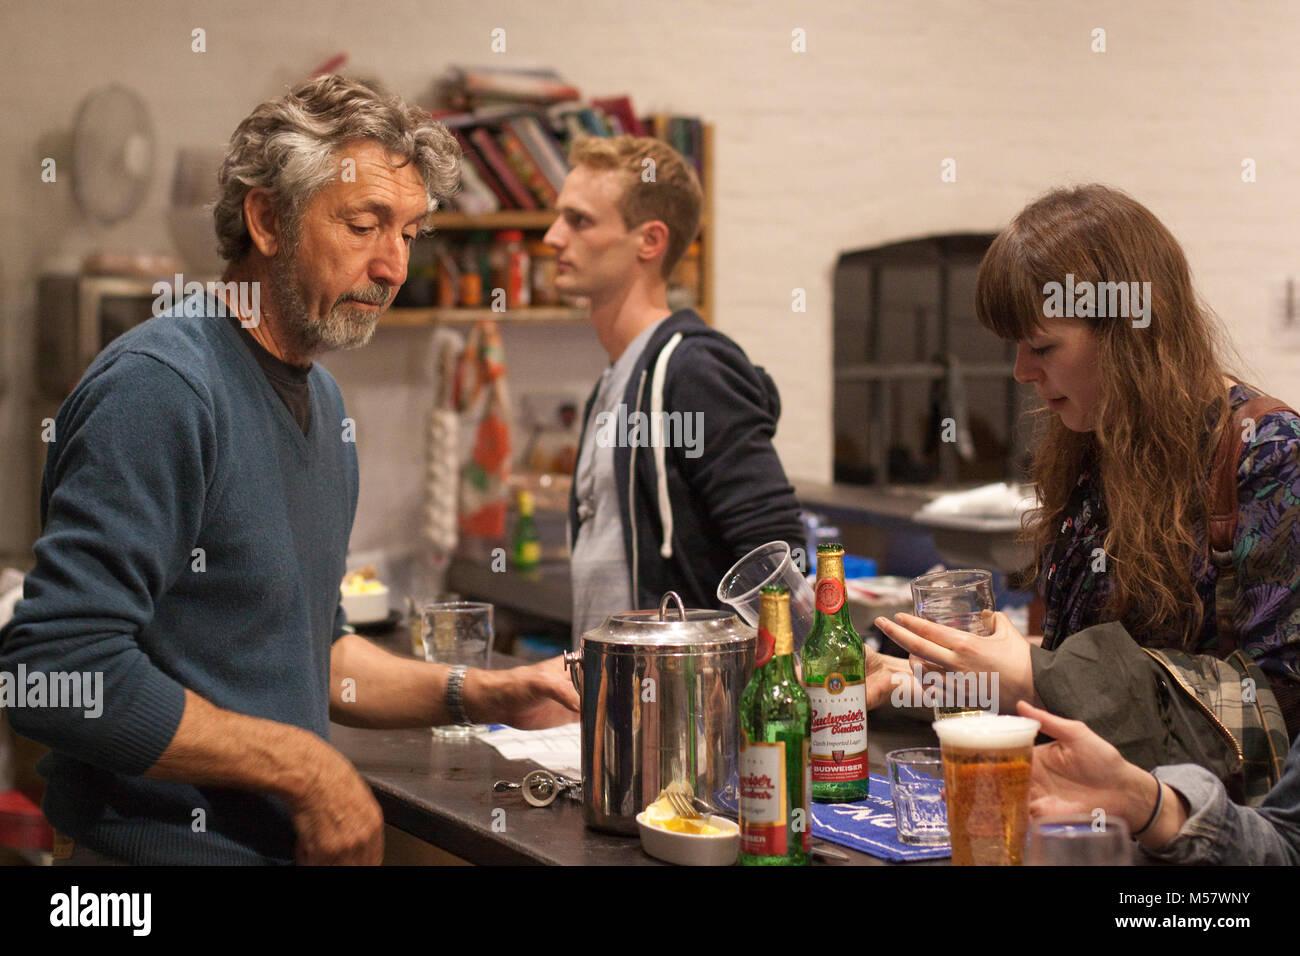 Bearded man serves at an arts centre bar - Stock Image